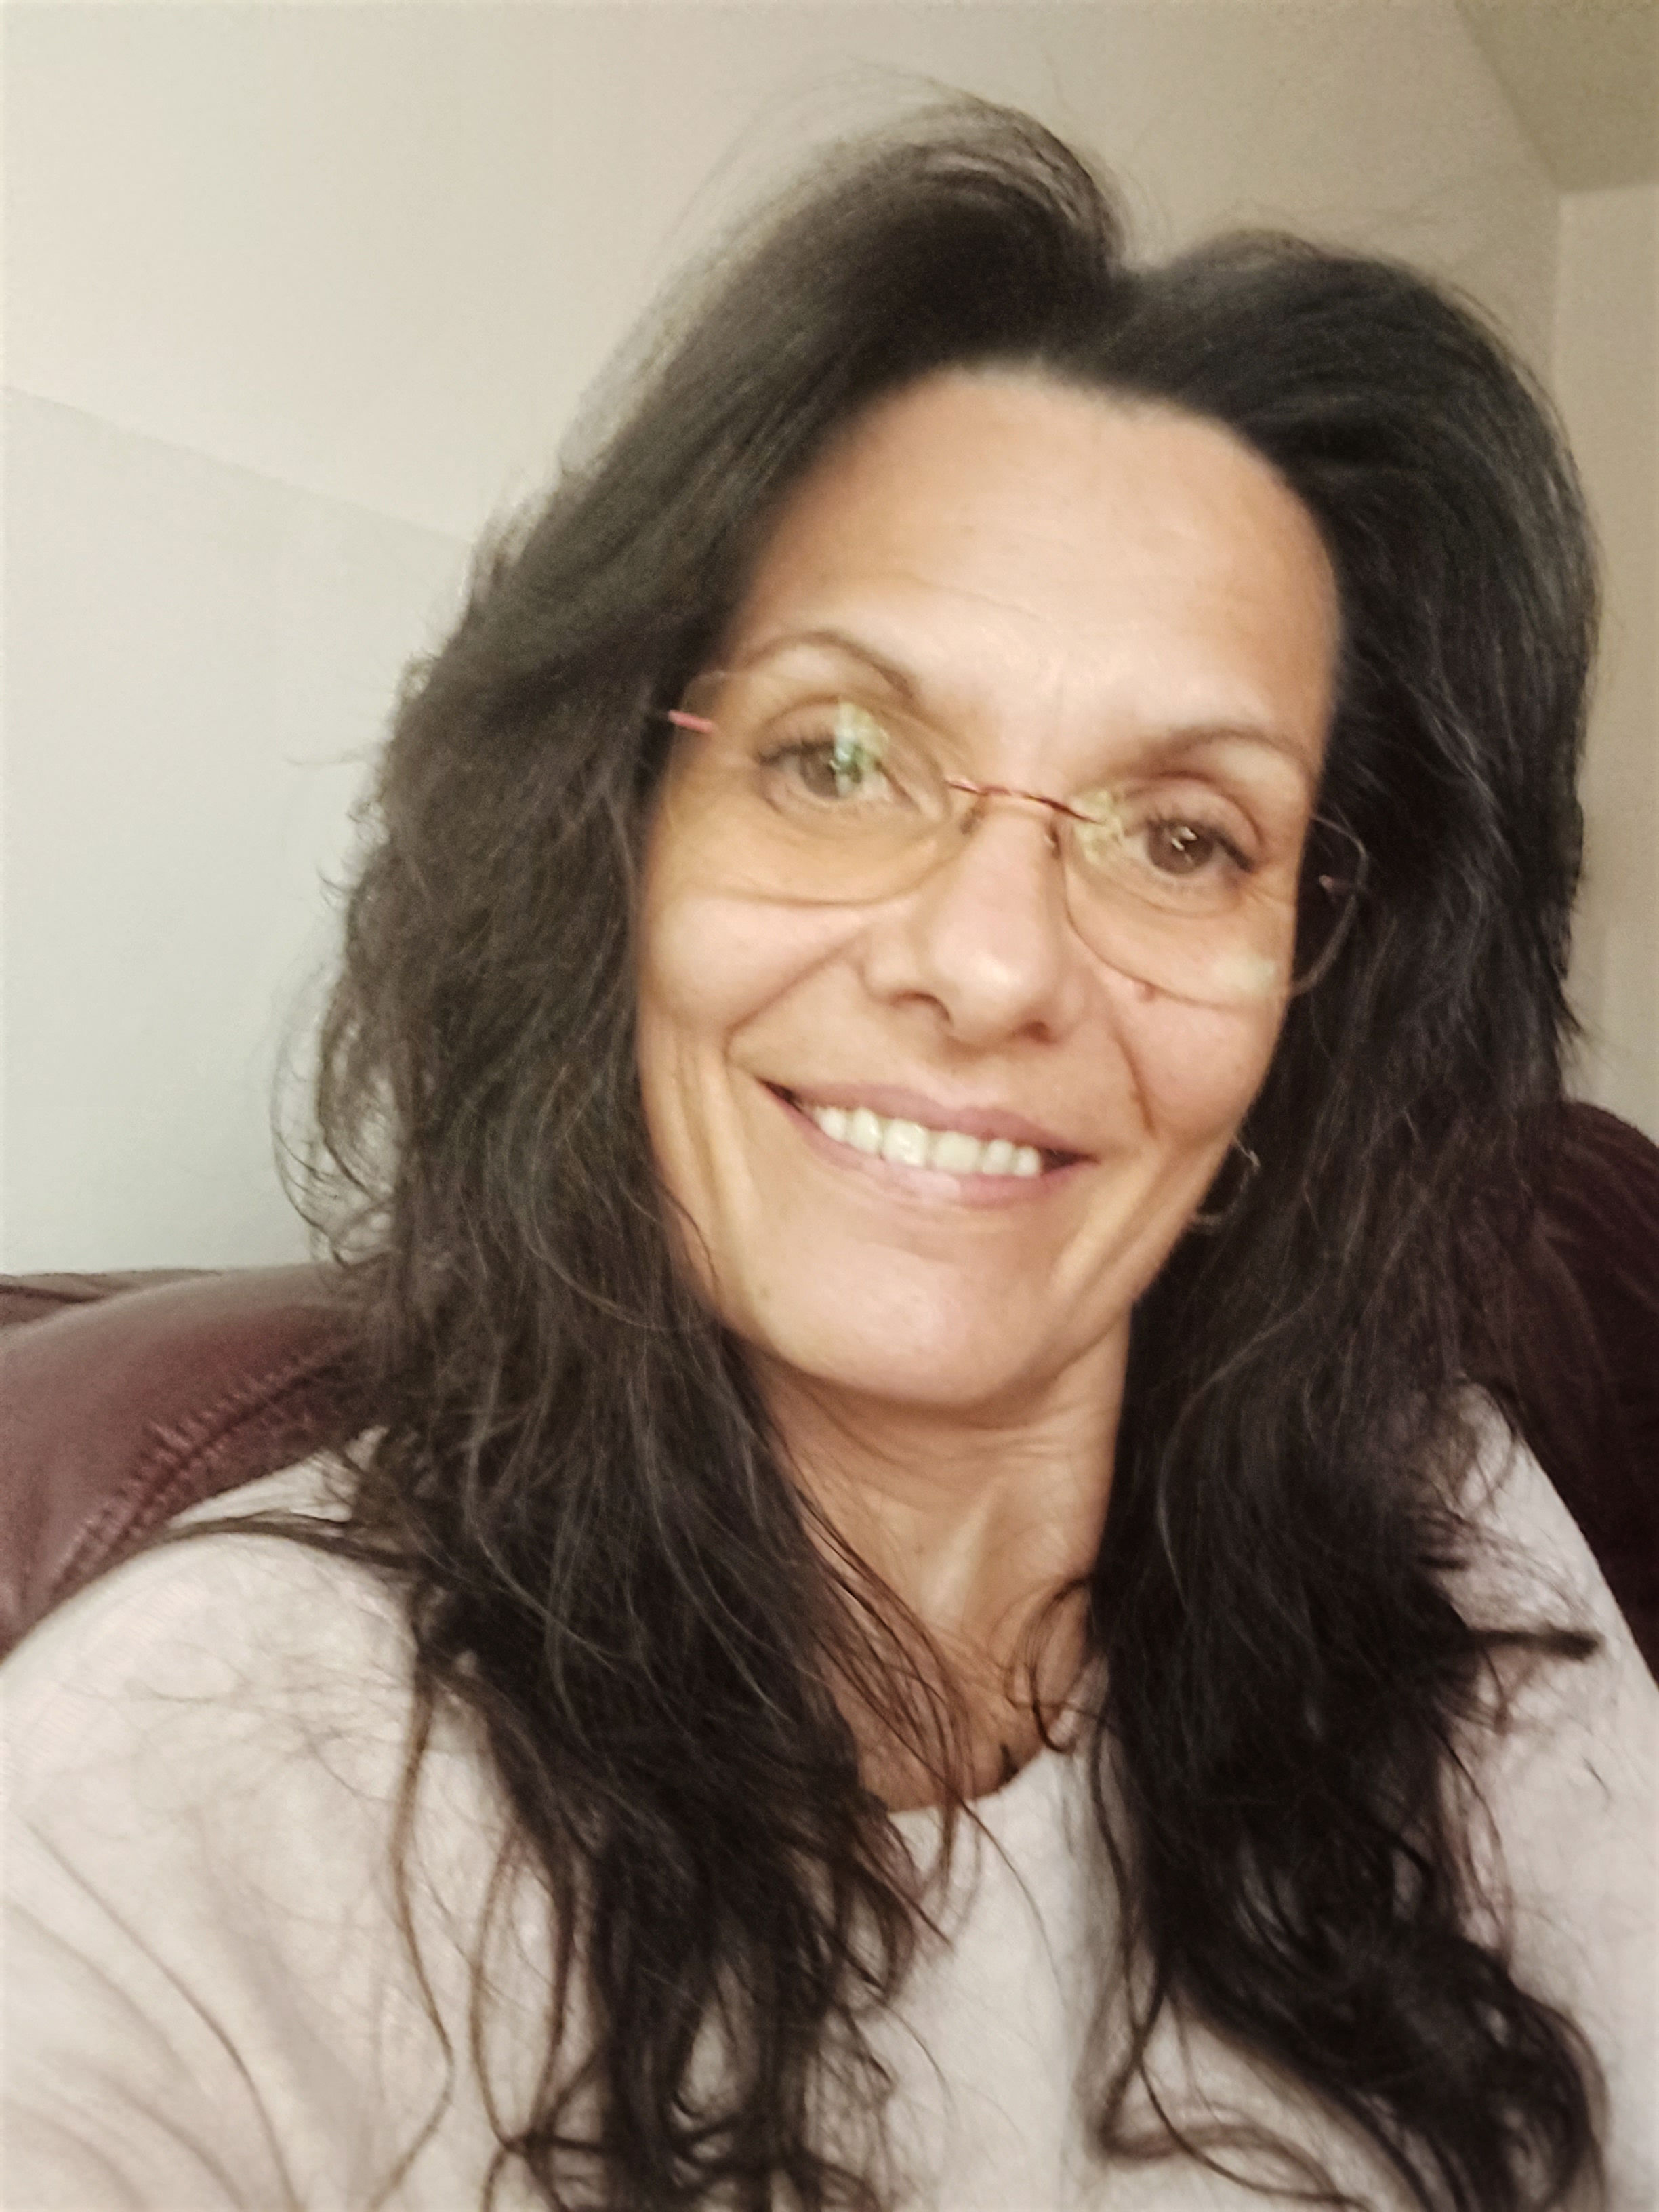 La Sortie - Lyne - Coordonatrice clinique - Clinical coordinator